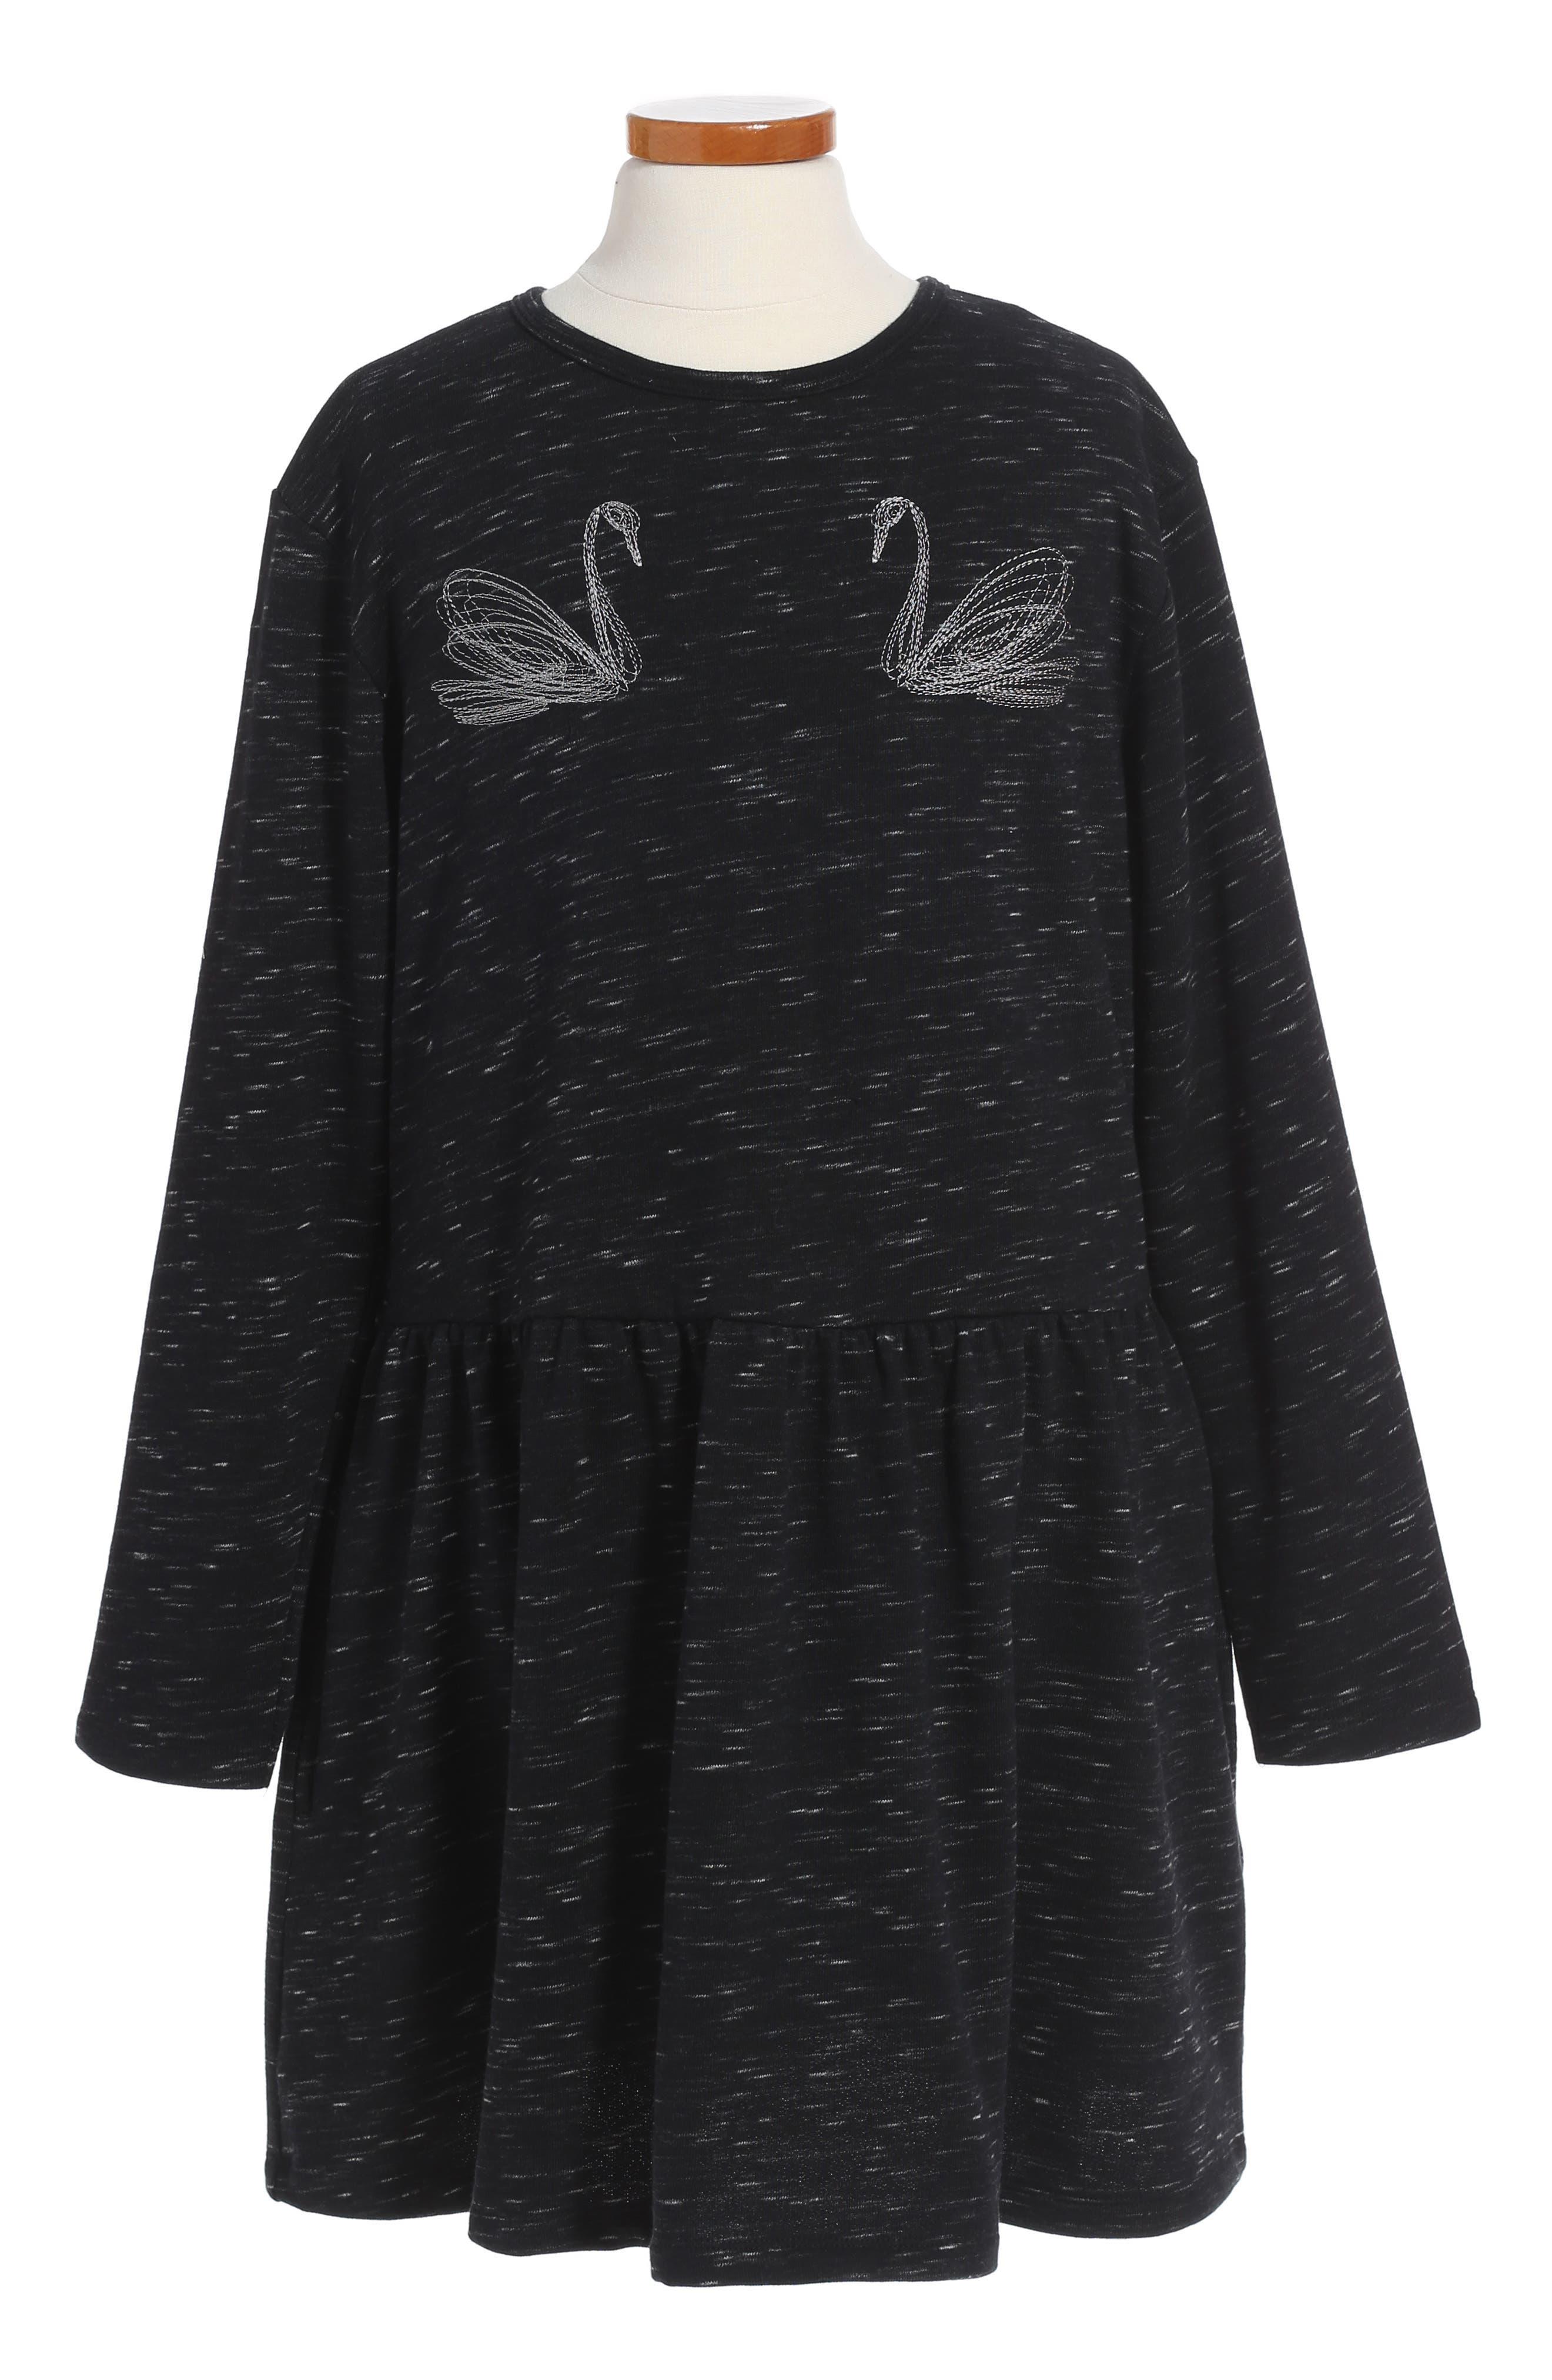 Main Image - Stella McCartney Kids Marion Embroidered Dress (Toddler Girls, Little Girls & Big Girls)